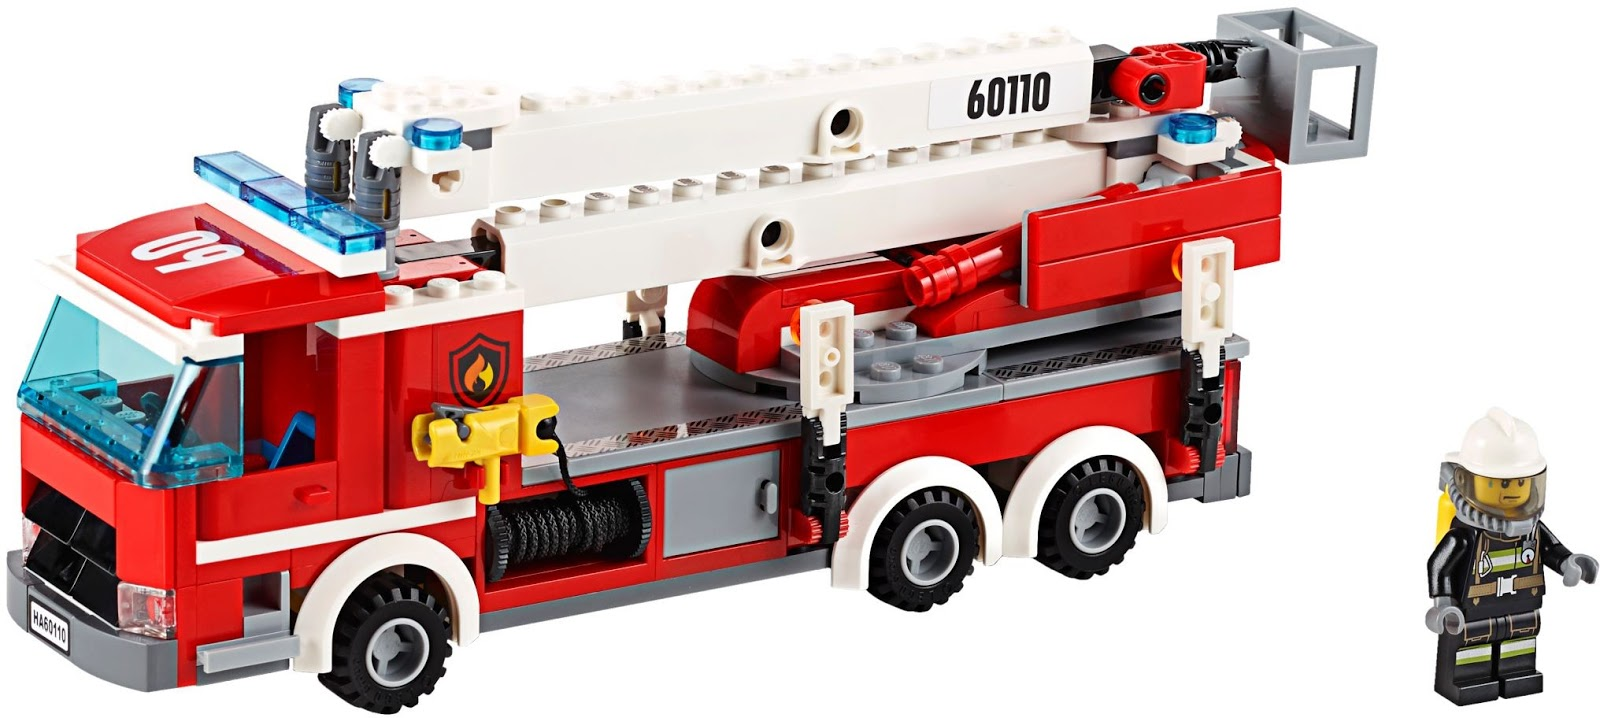 Detoyz Shop 2016 New Lego City 60110 Fire Station Set